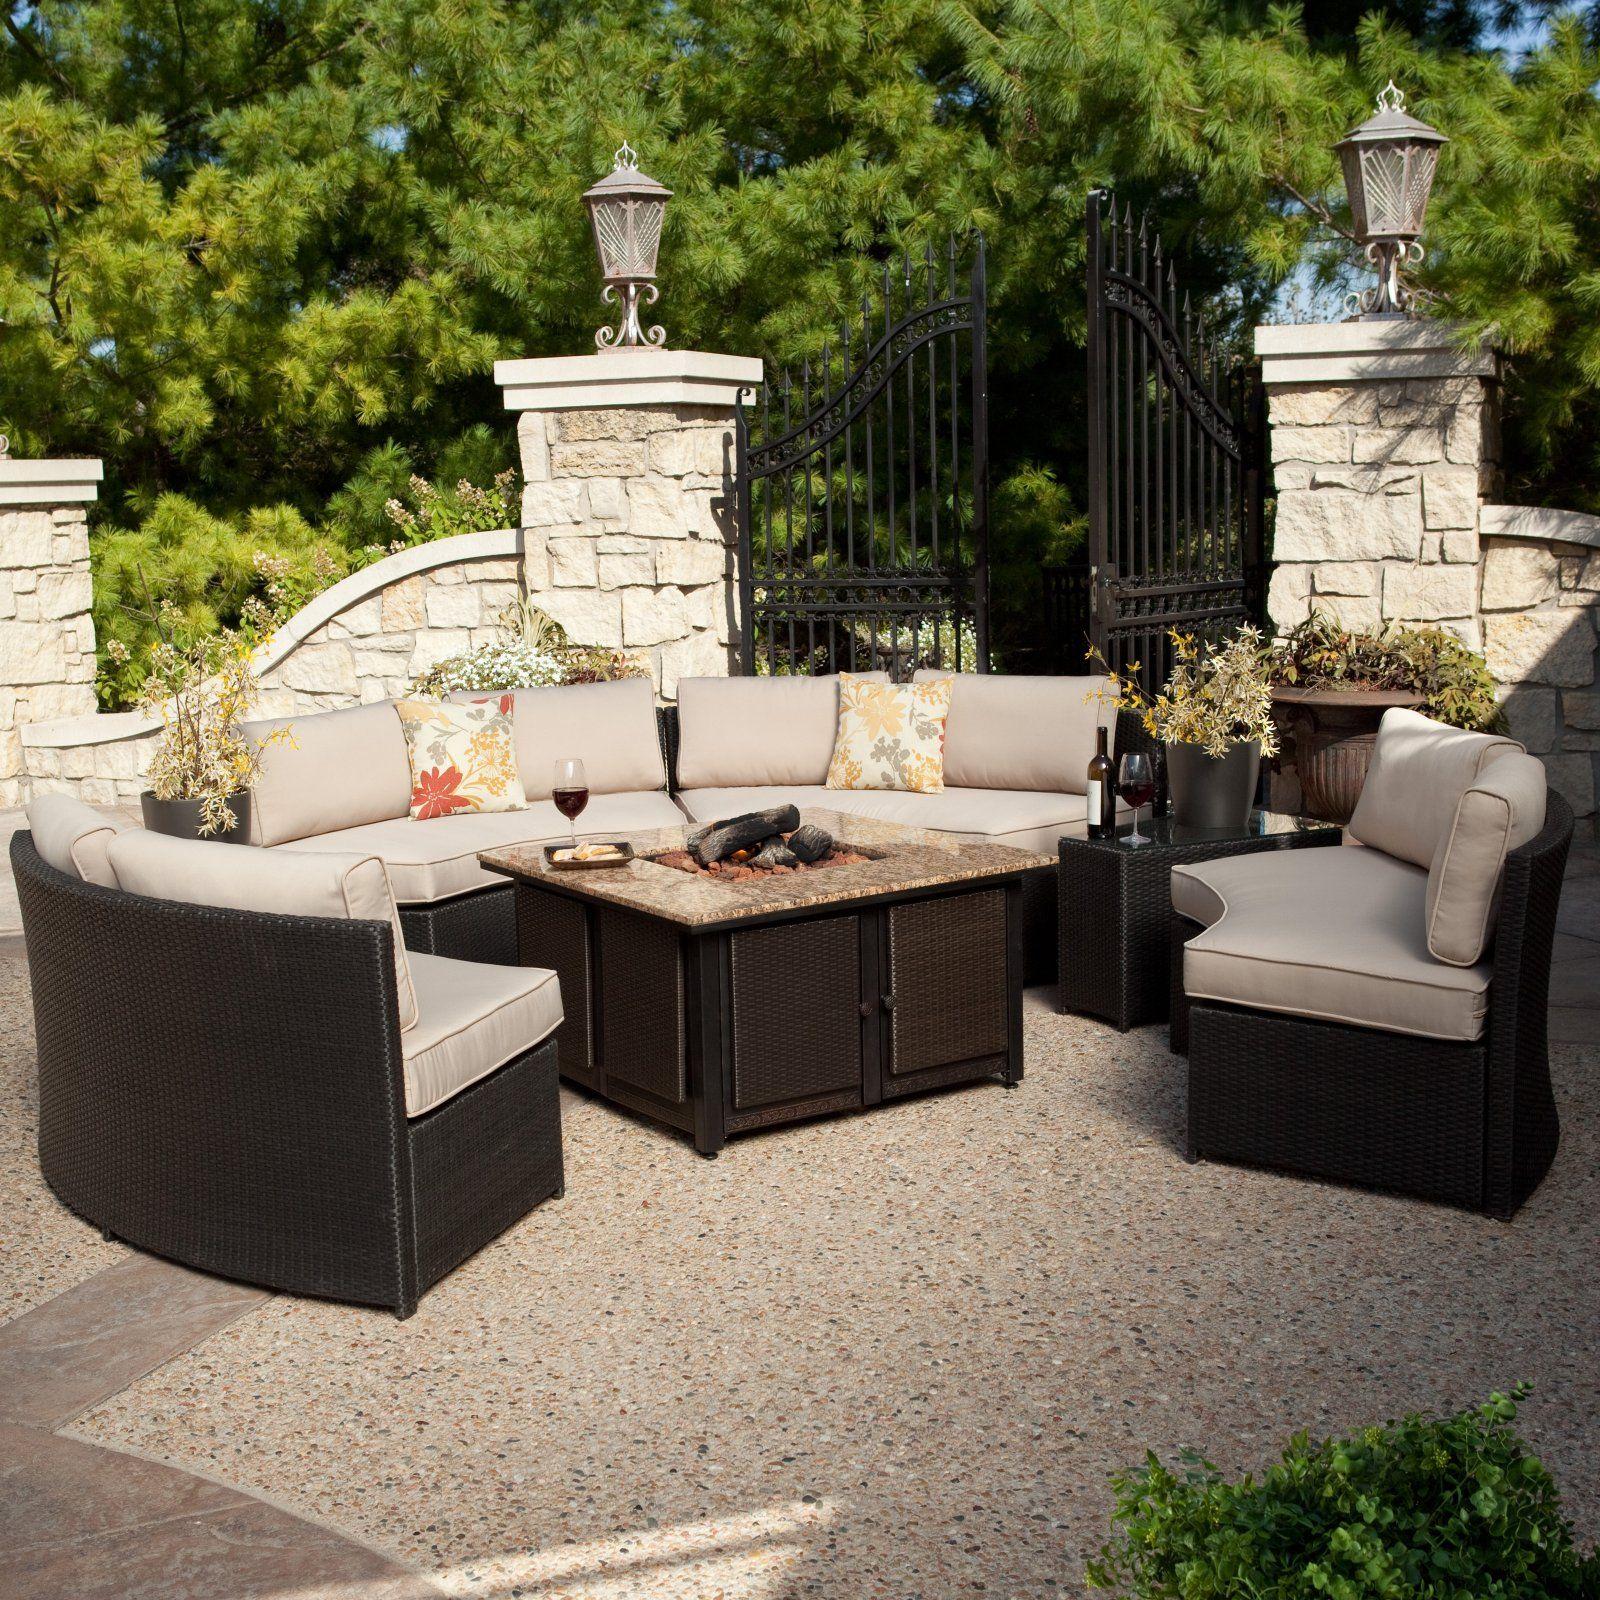 Patio Ideas Wicker Patio Furniture Set Outdoor Wicker Patio Furniture